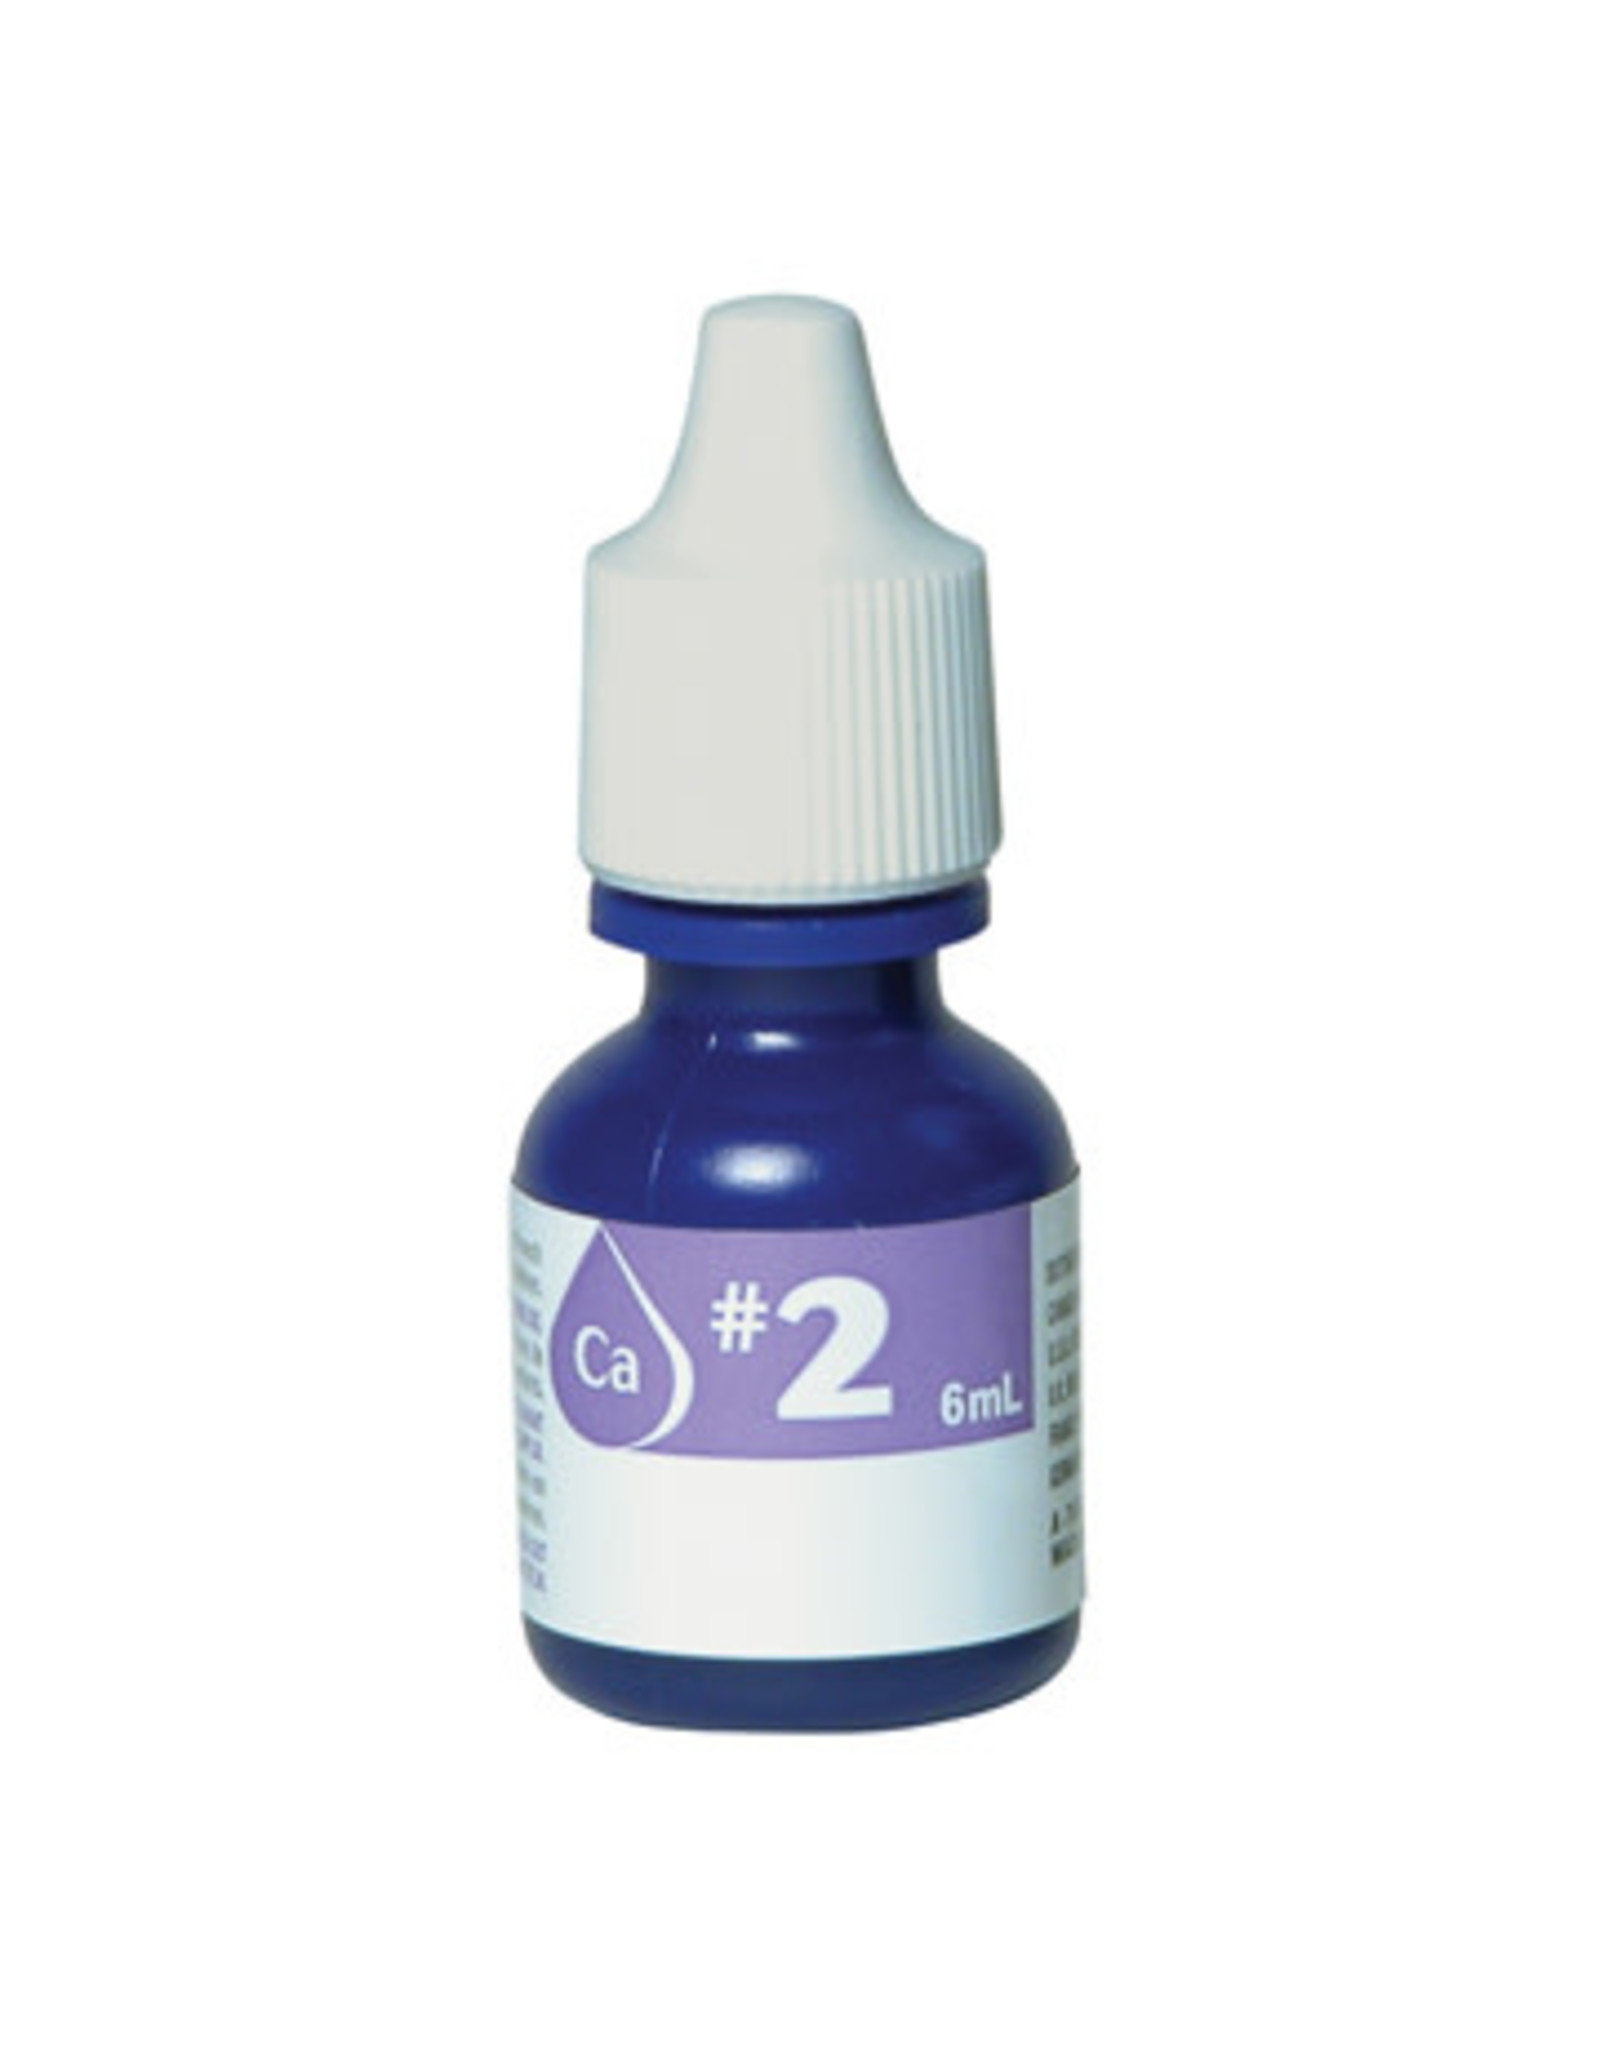 Nutrafin Nutrafin Calcium reagent #2 refill, 6 mL (0.2 fl oz)